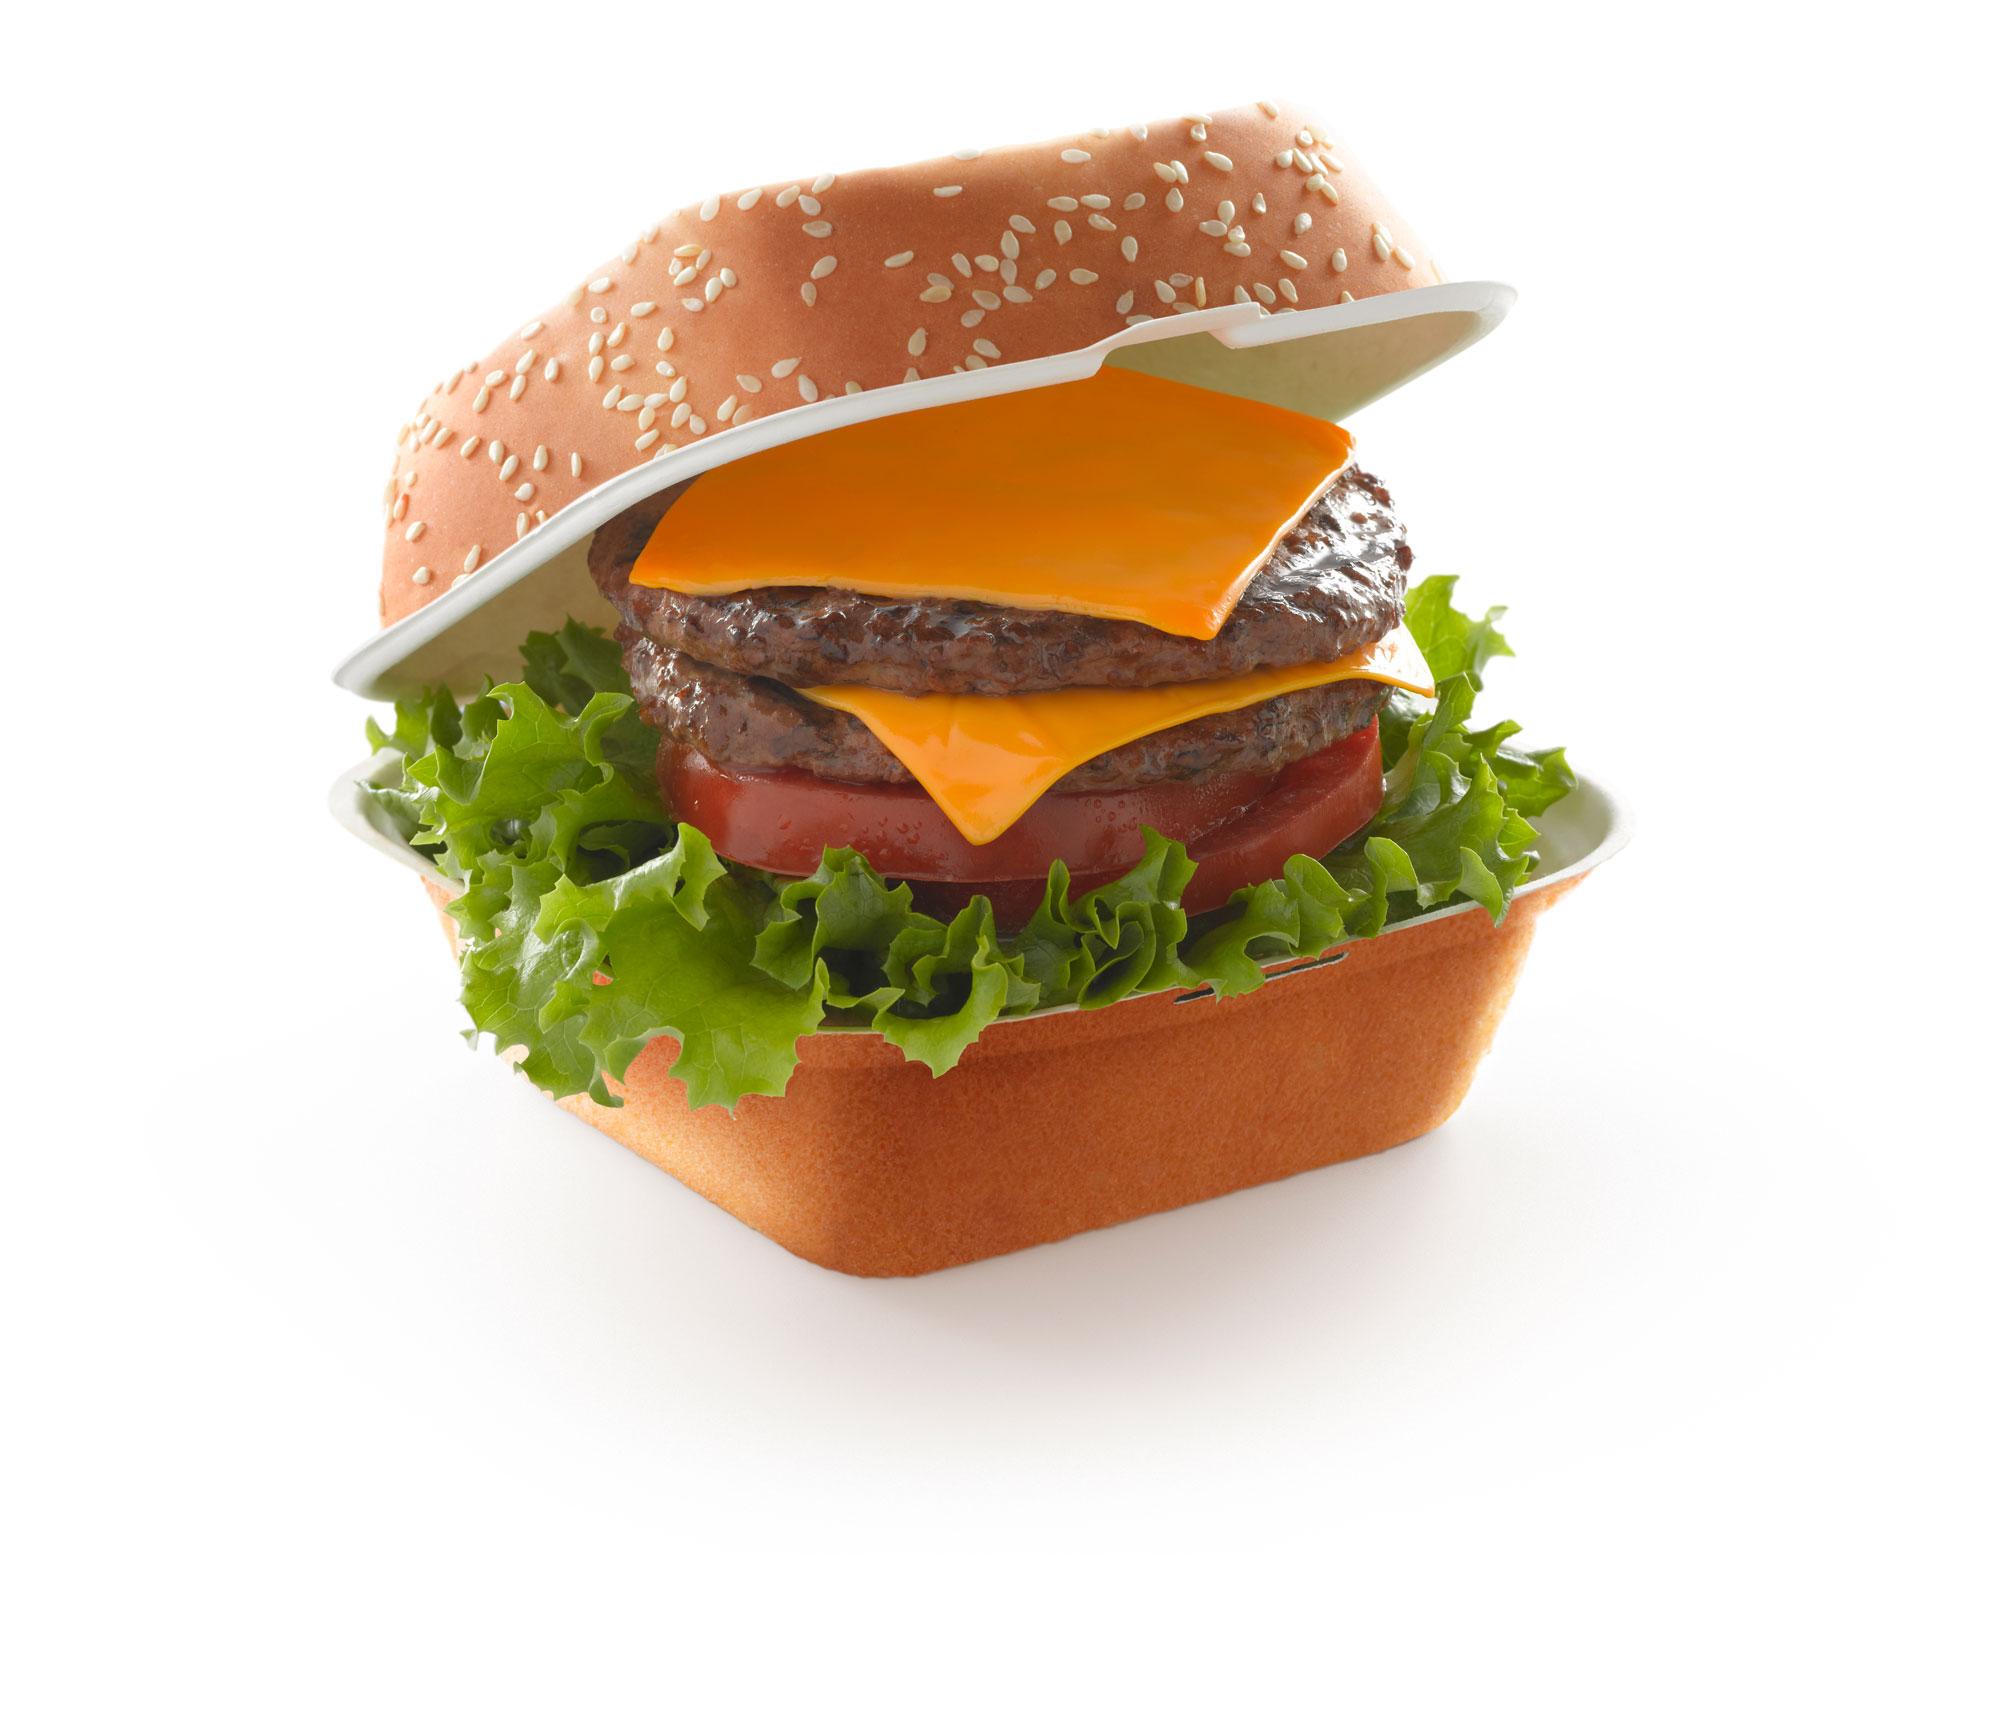 Cheeseburger00007.jpg